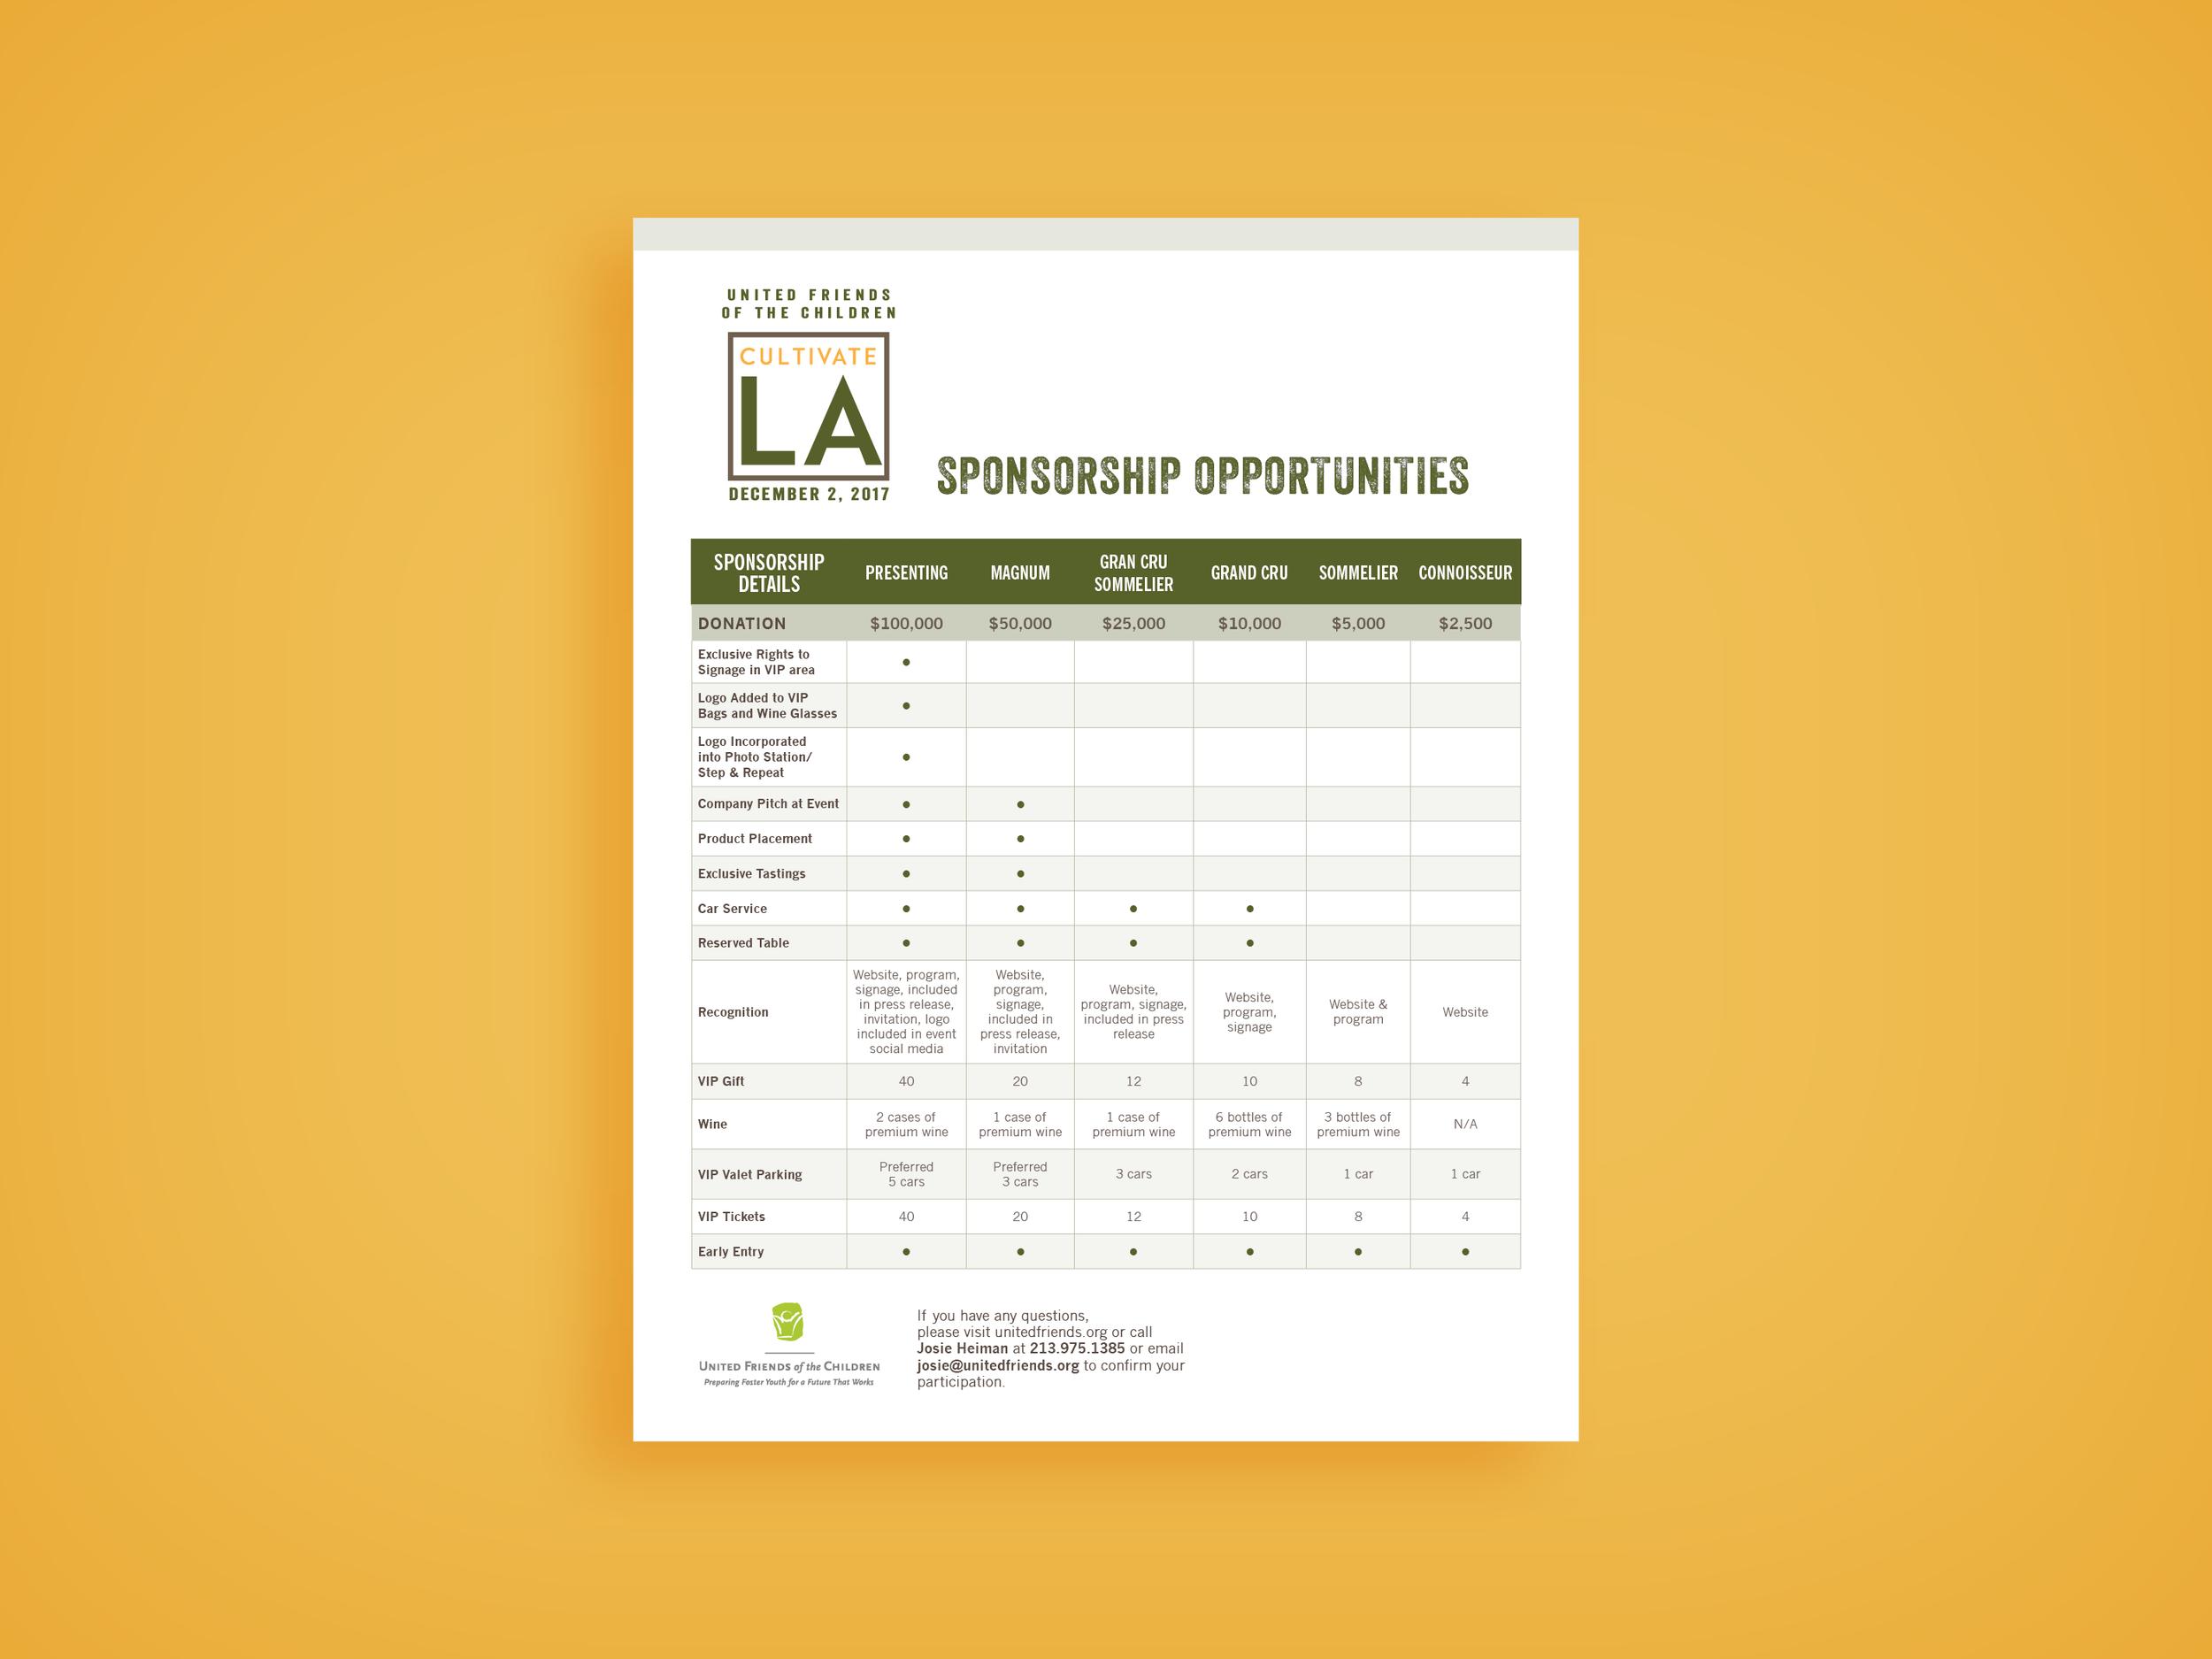 Cultivate LA_Forms.png